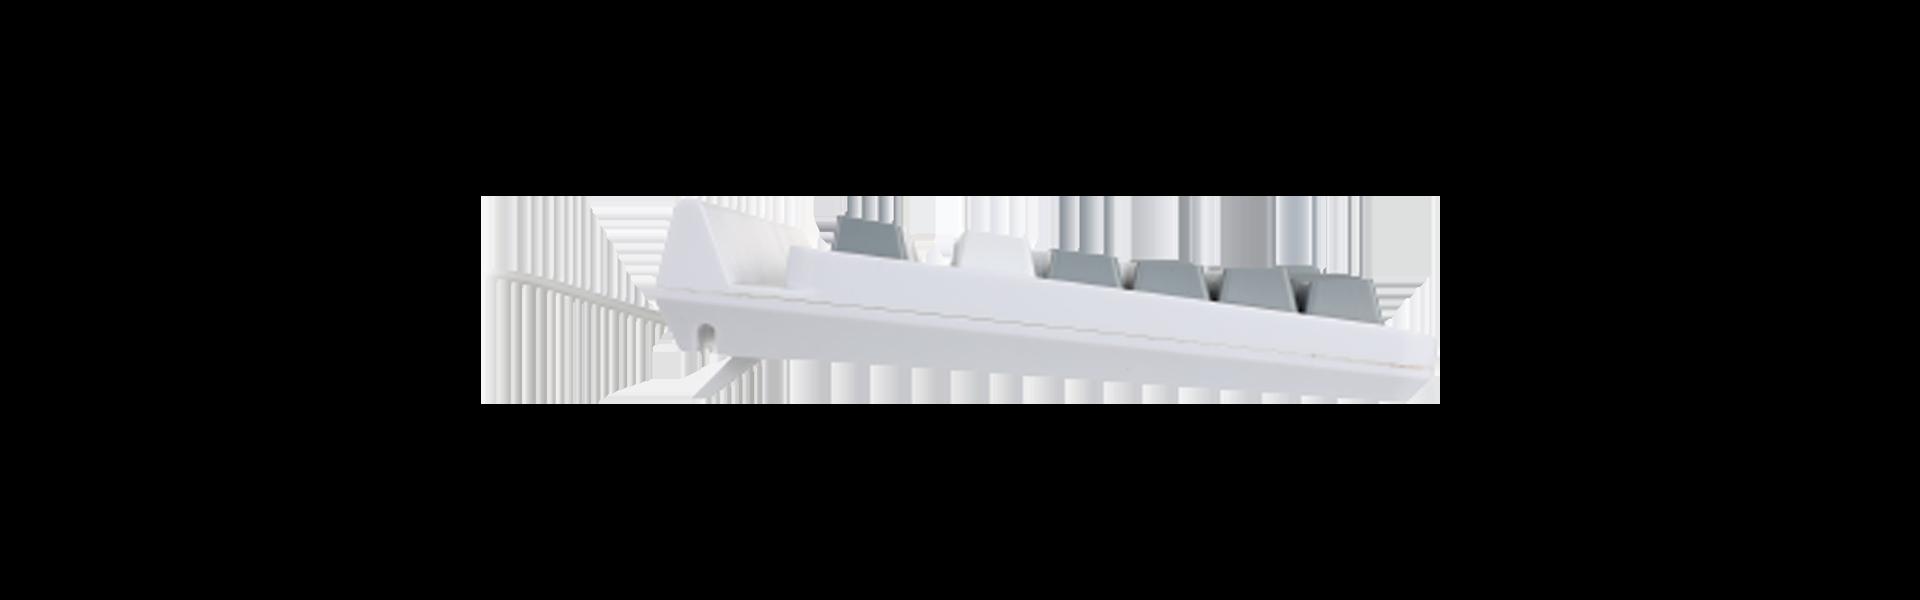 Mobile Device Meca Fighter Ice SE